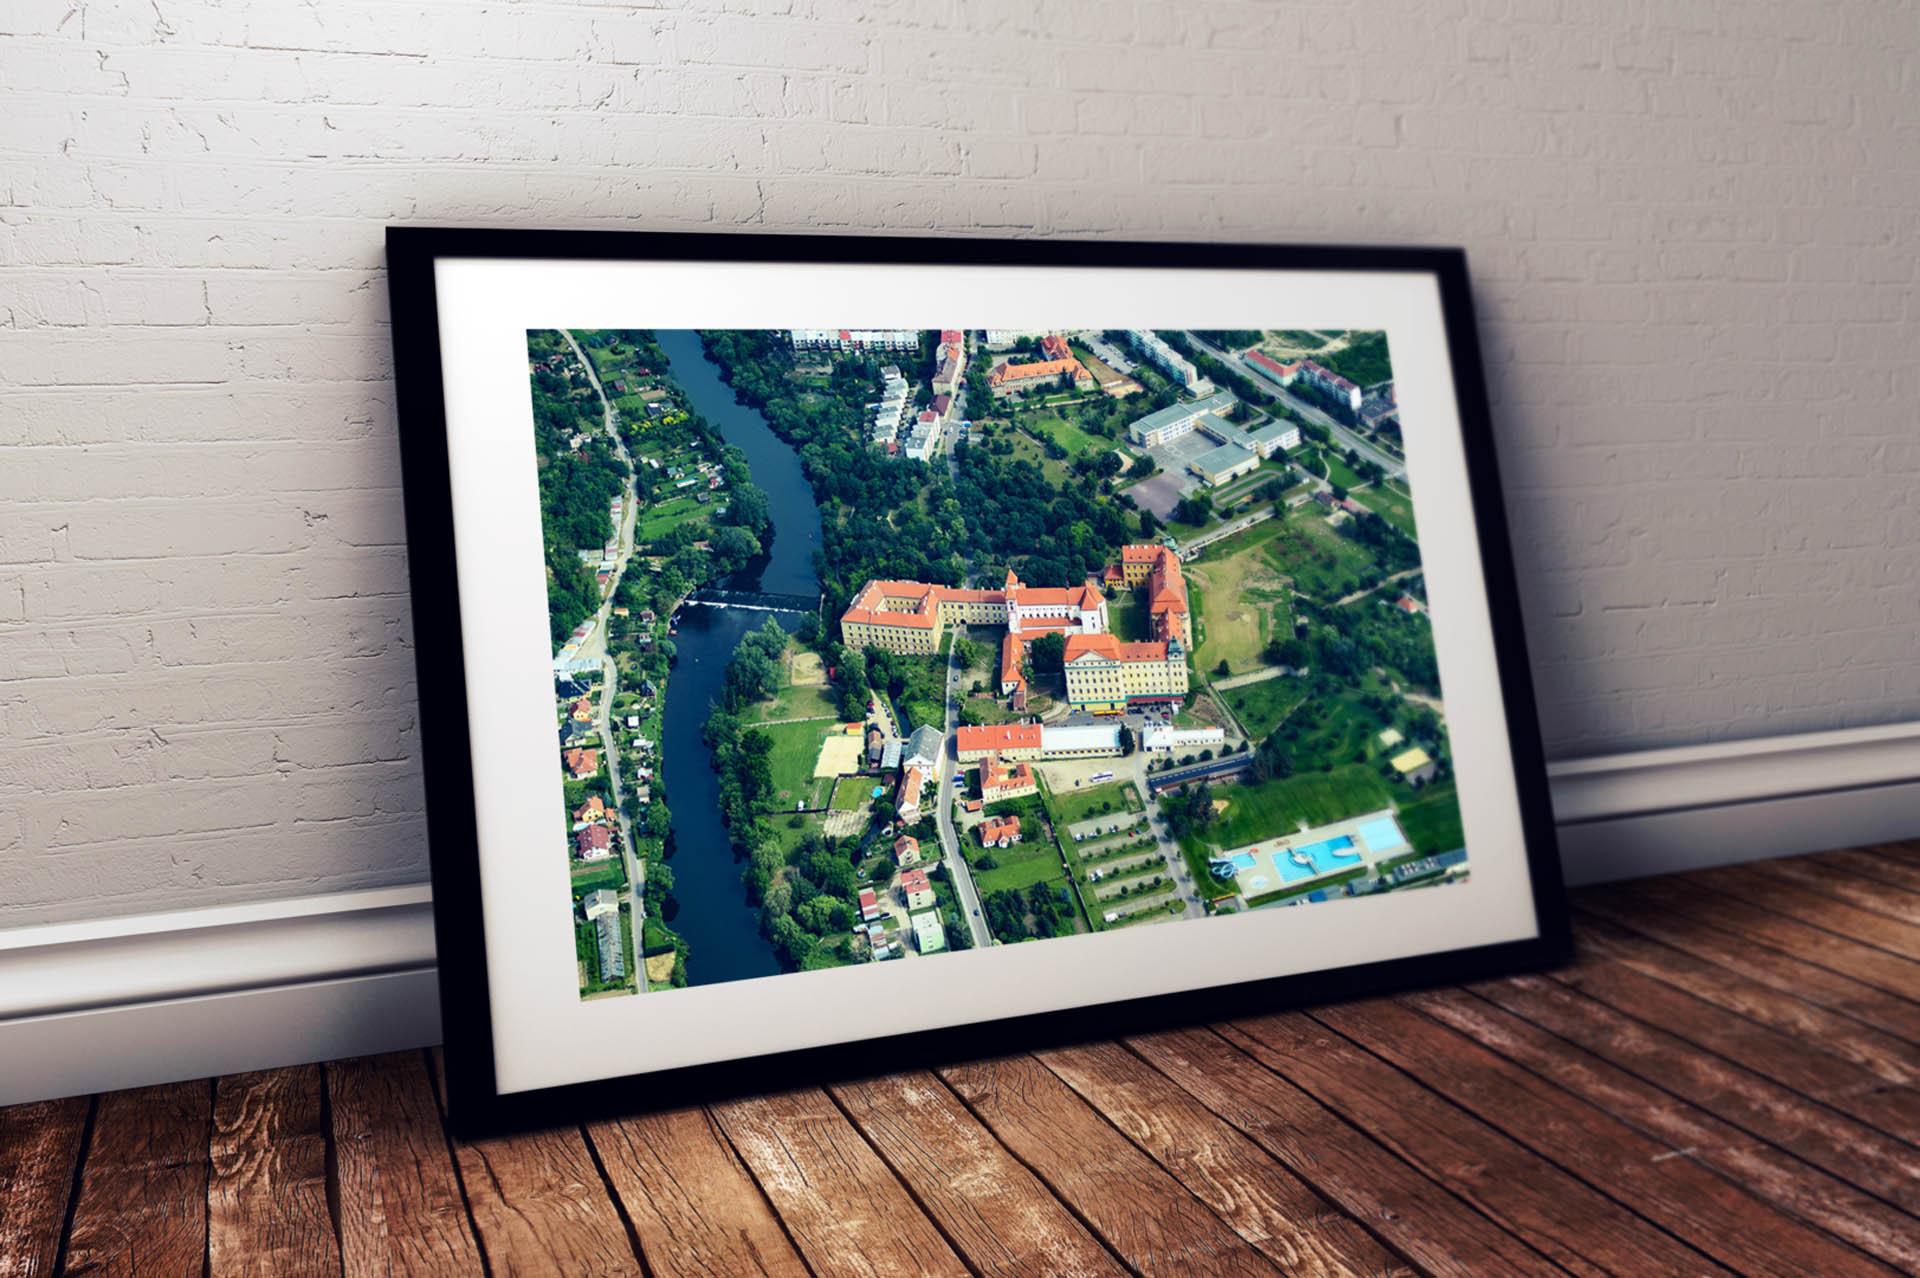 Adatto.cz letecké fotografie - Loucký klášter Znojmo